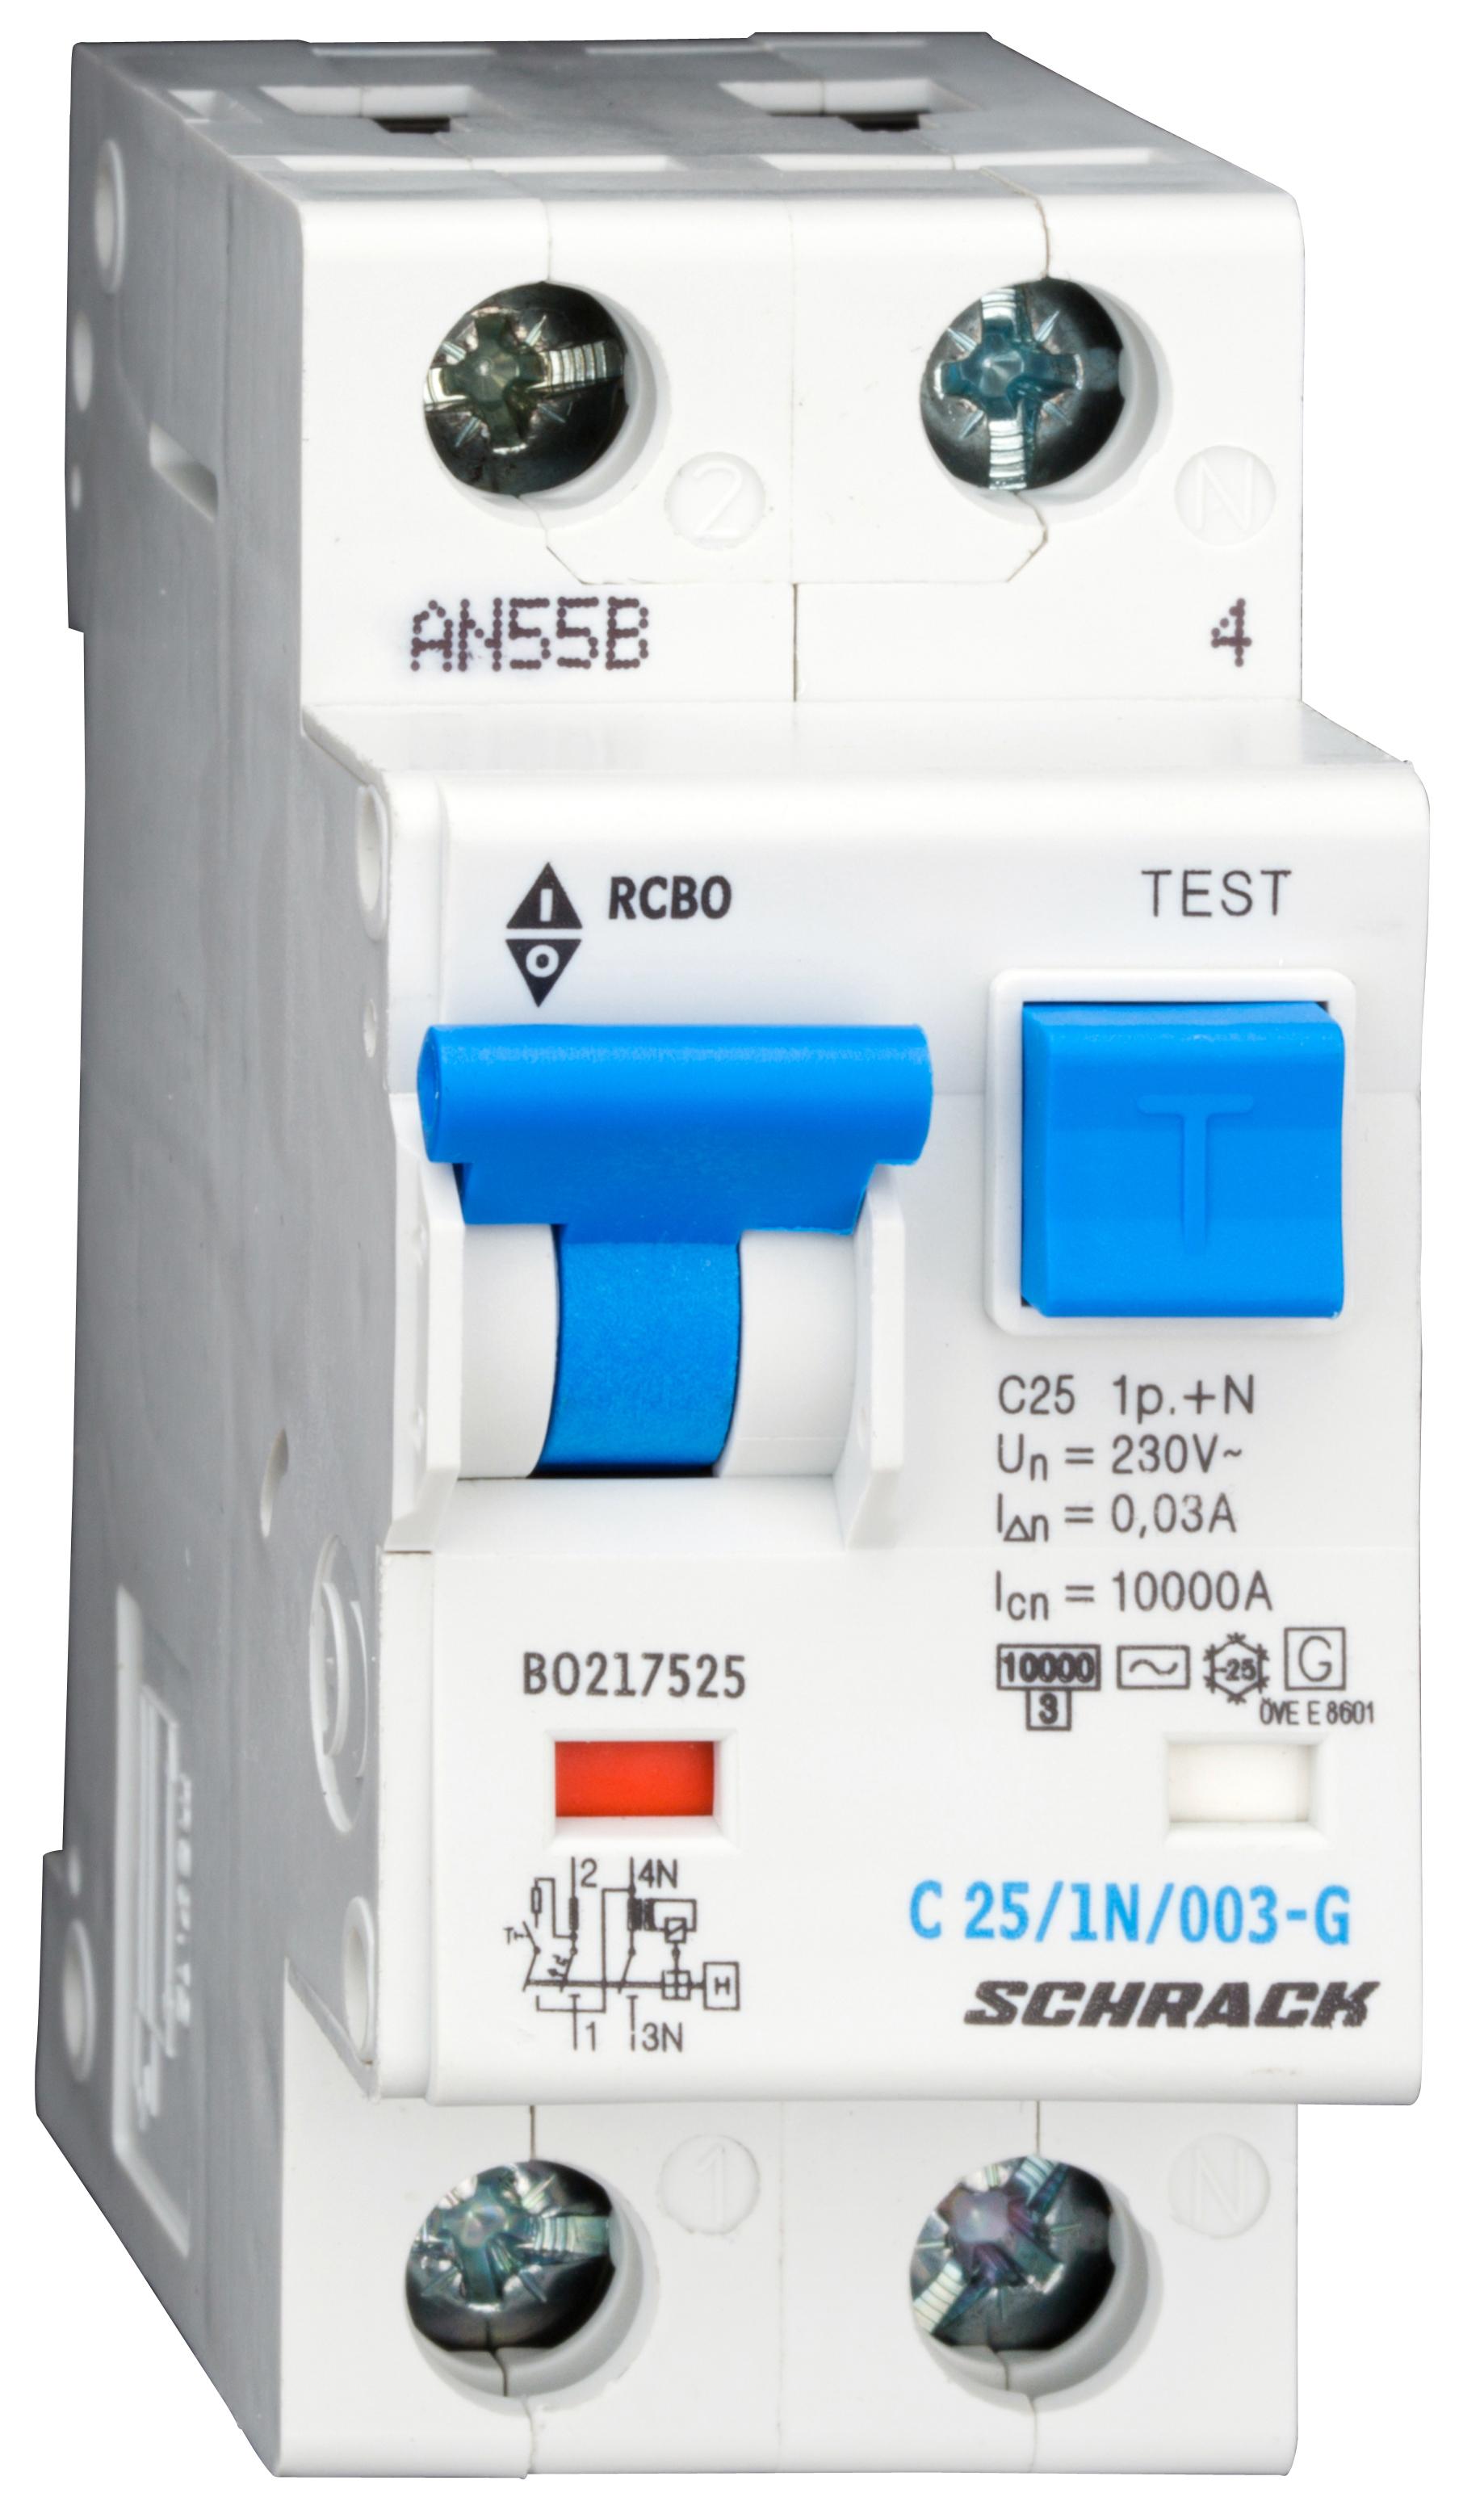 1 Stk LS-FI-Schalter,Kennl. C, 25A,30mA,1-polig+N, Bauart G,Typ AC BO217525--